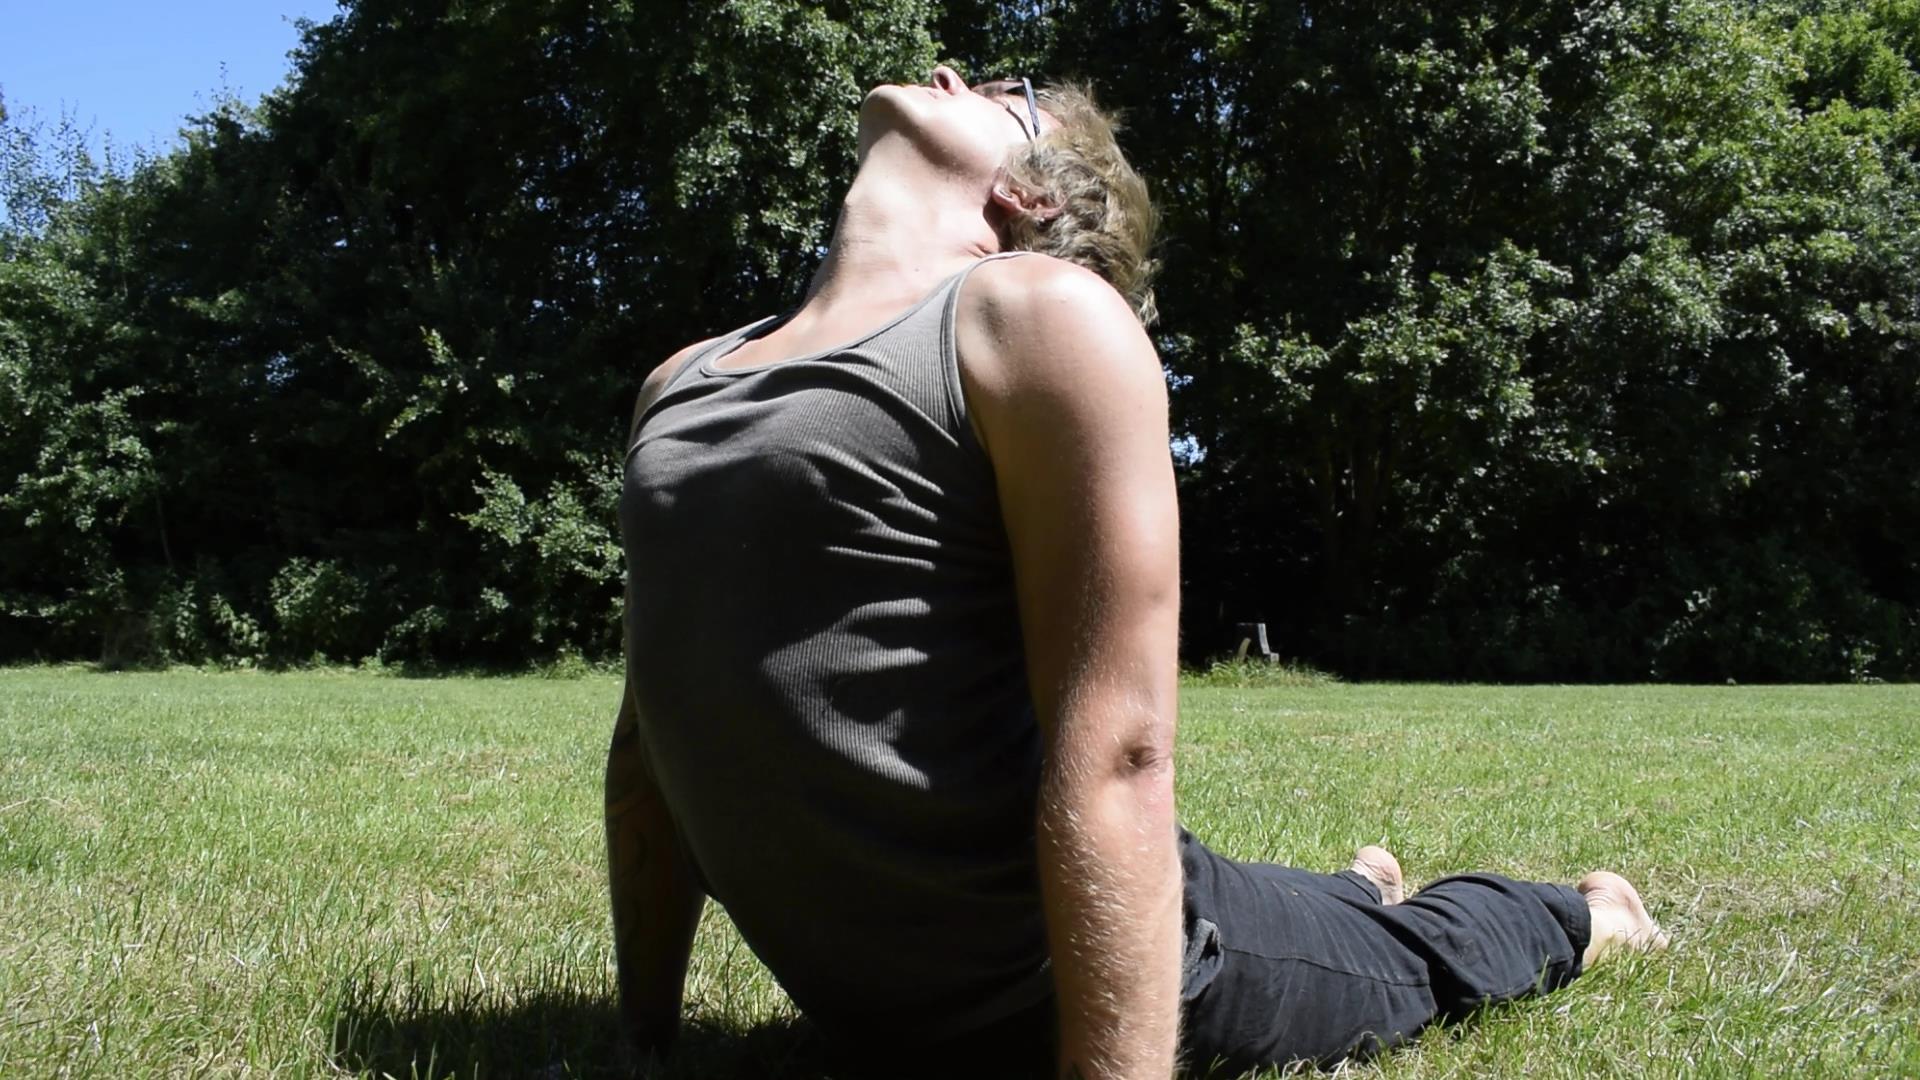 Laurence doing a yoga backbend - Upward Facing Dog. In Sudbury, Suffolk. Norwich